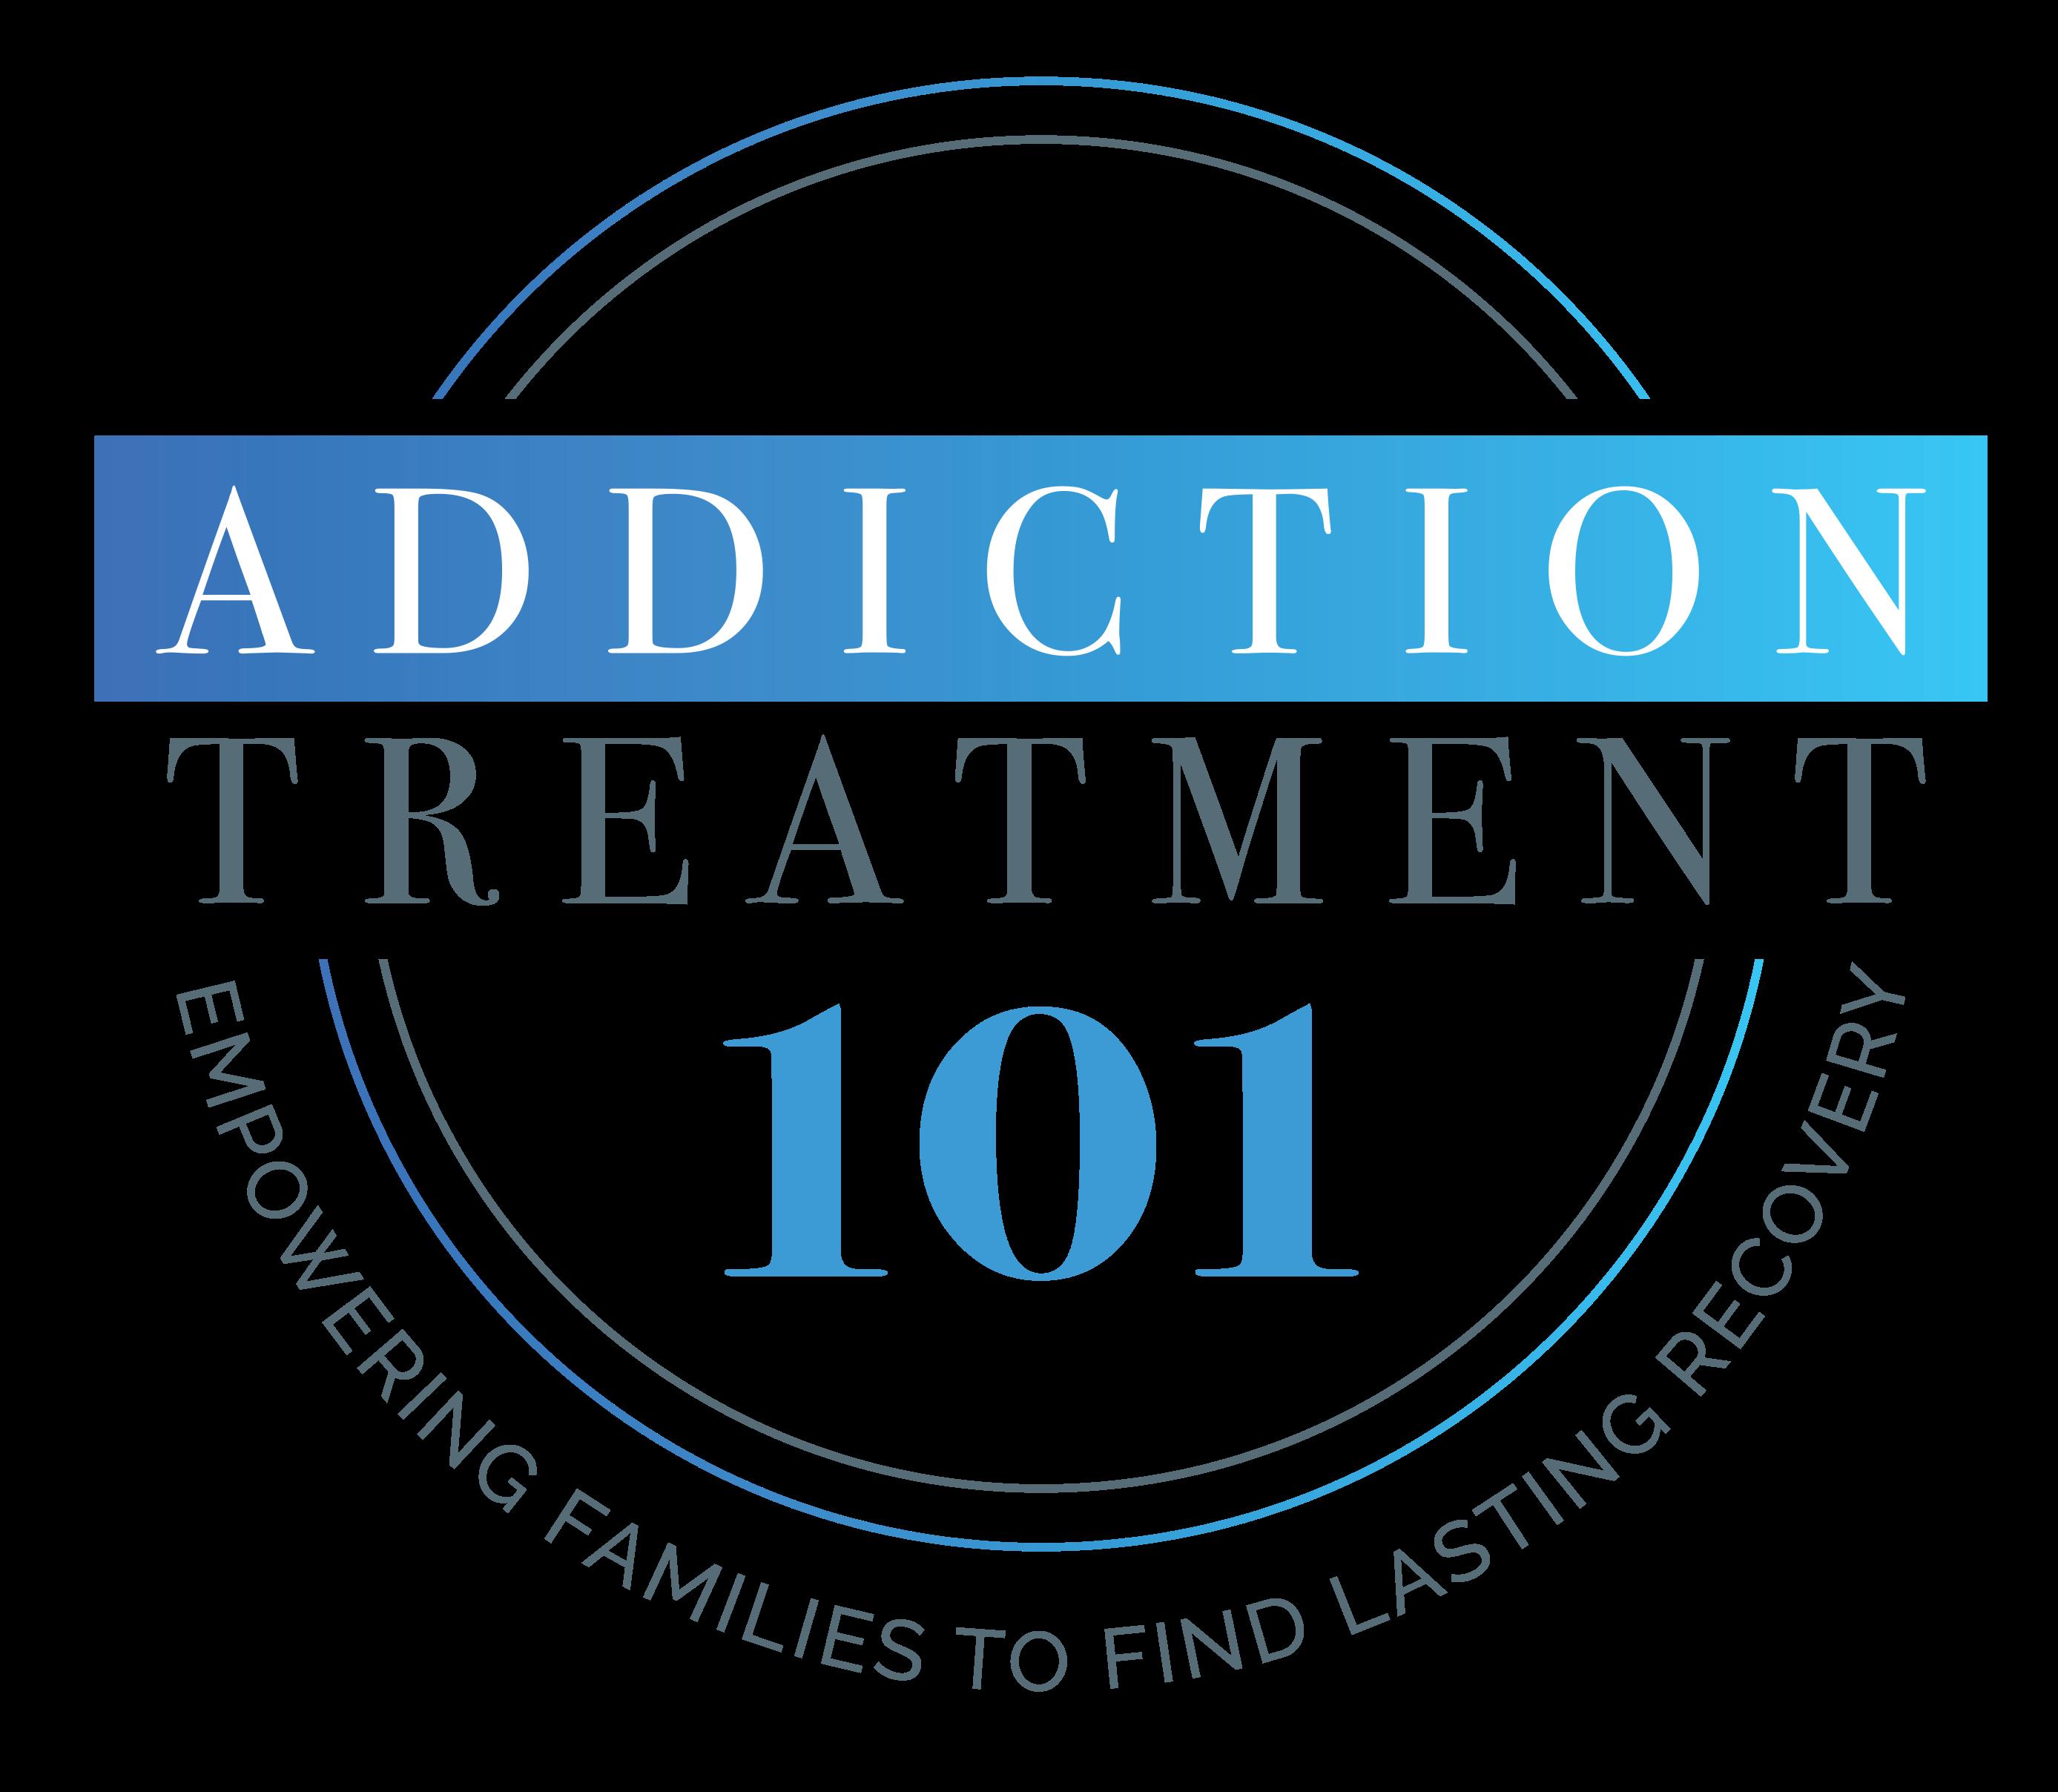 Addiction Treatment 101 show art